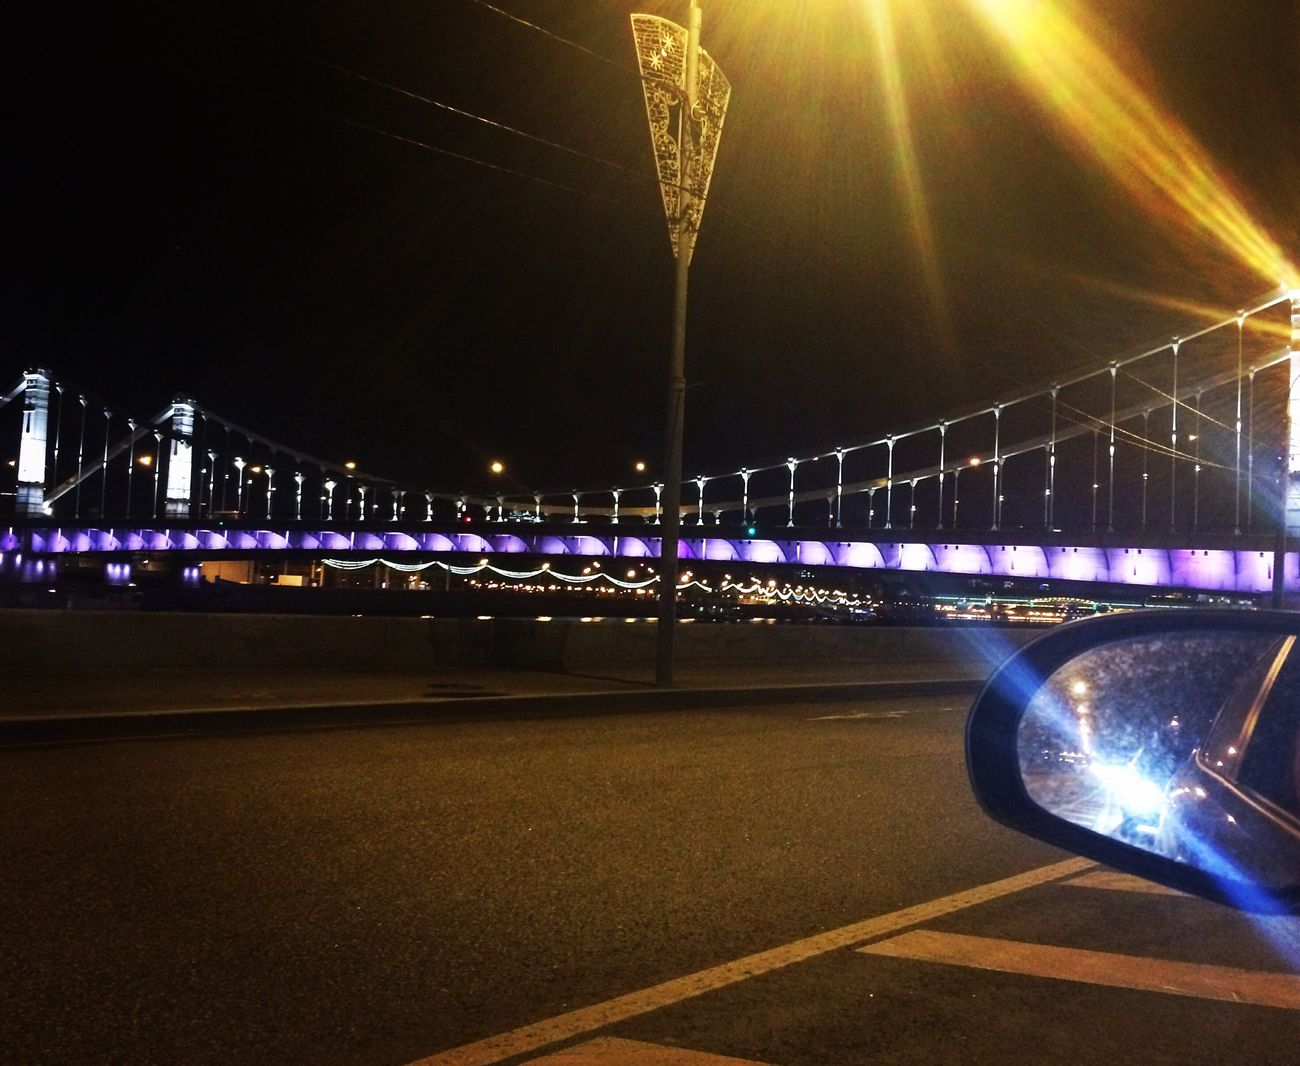 Bridge - Man Made Structure Night Transportation Street Light Bridge Road City No People City Life Beatiful Happy Time Myeyes Woman